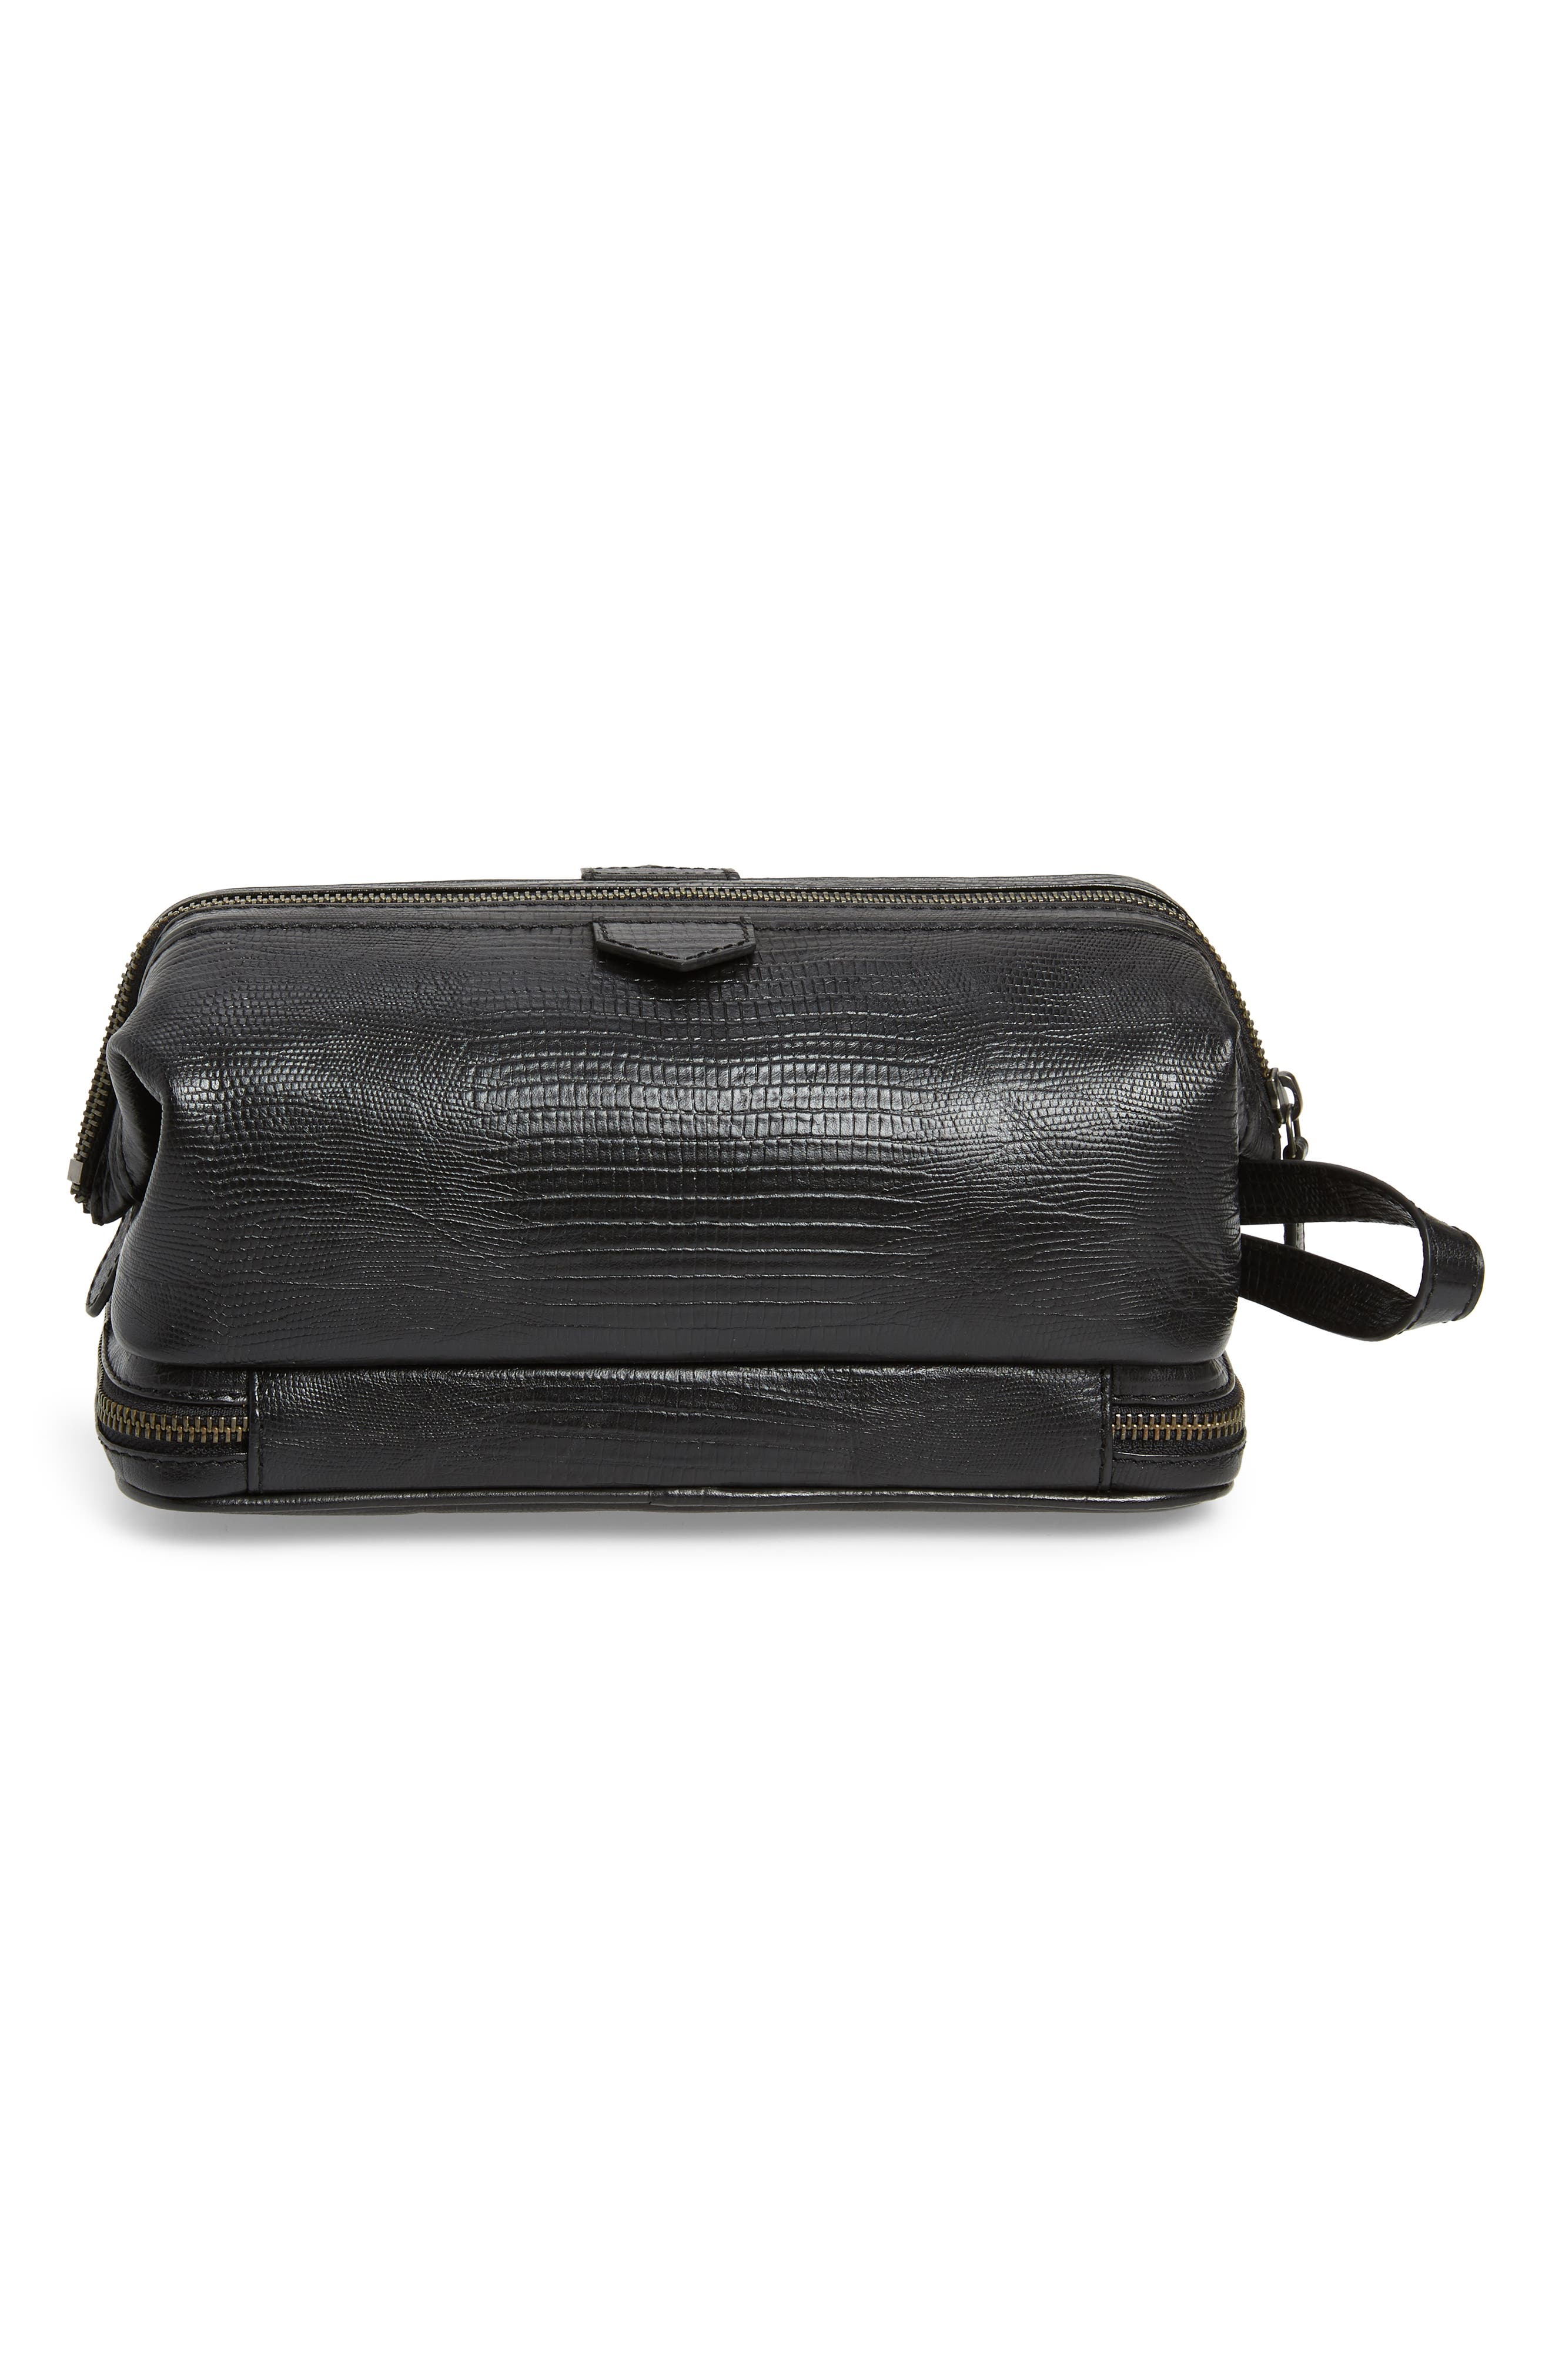 TED BAKER LONDON,                             Leather Travel Kit,                             Alternate thumbnail 2, color,                             BLACK